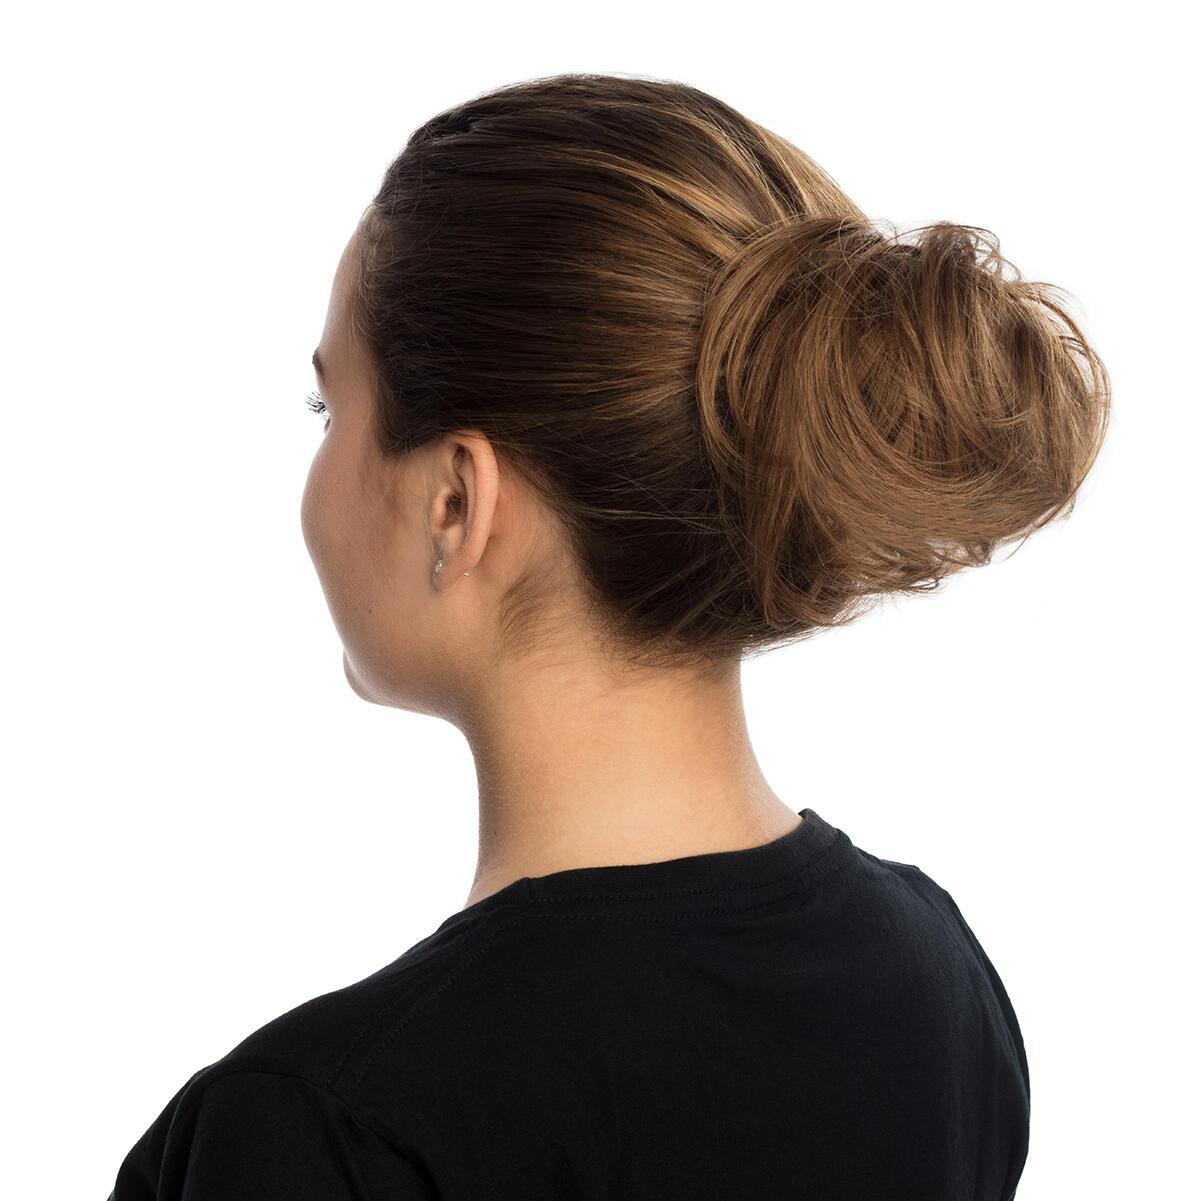 Hair Scrunchie 20 G Scrunchie with real hair 10.5 Grey